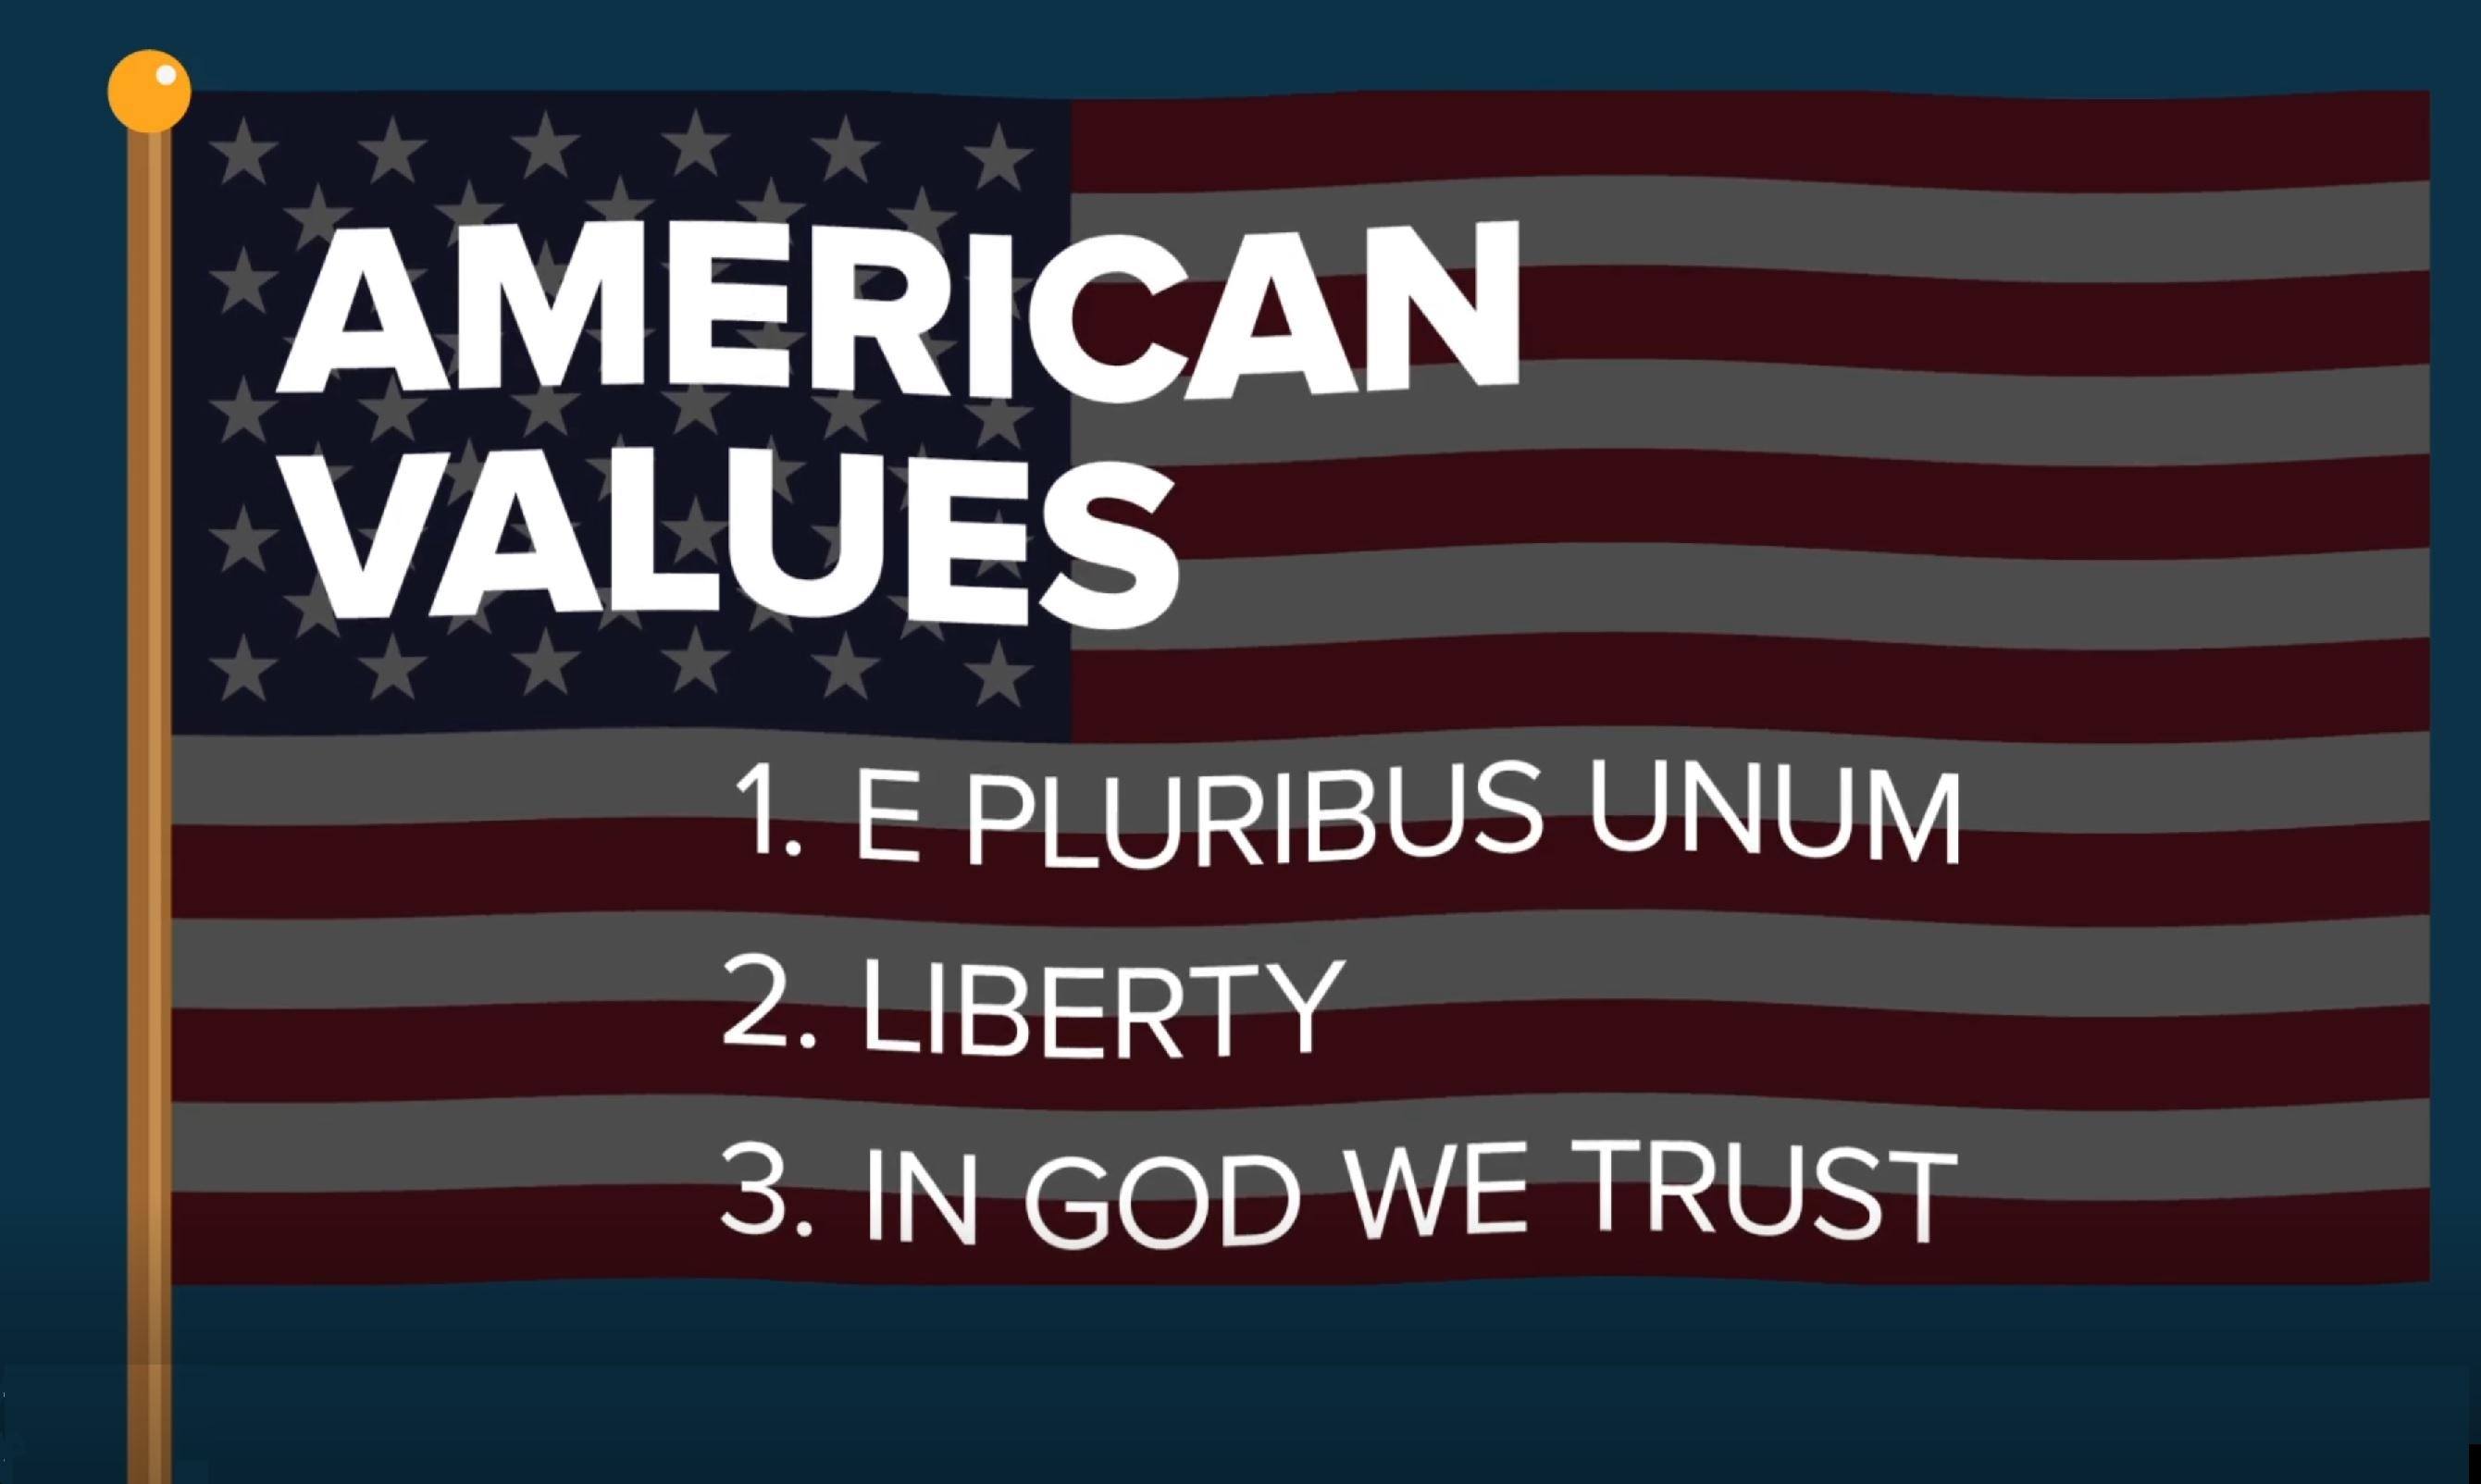 2020-10-10 Amercian Values